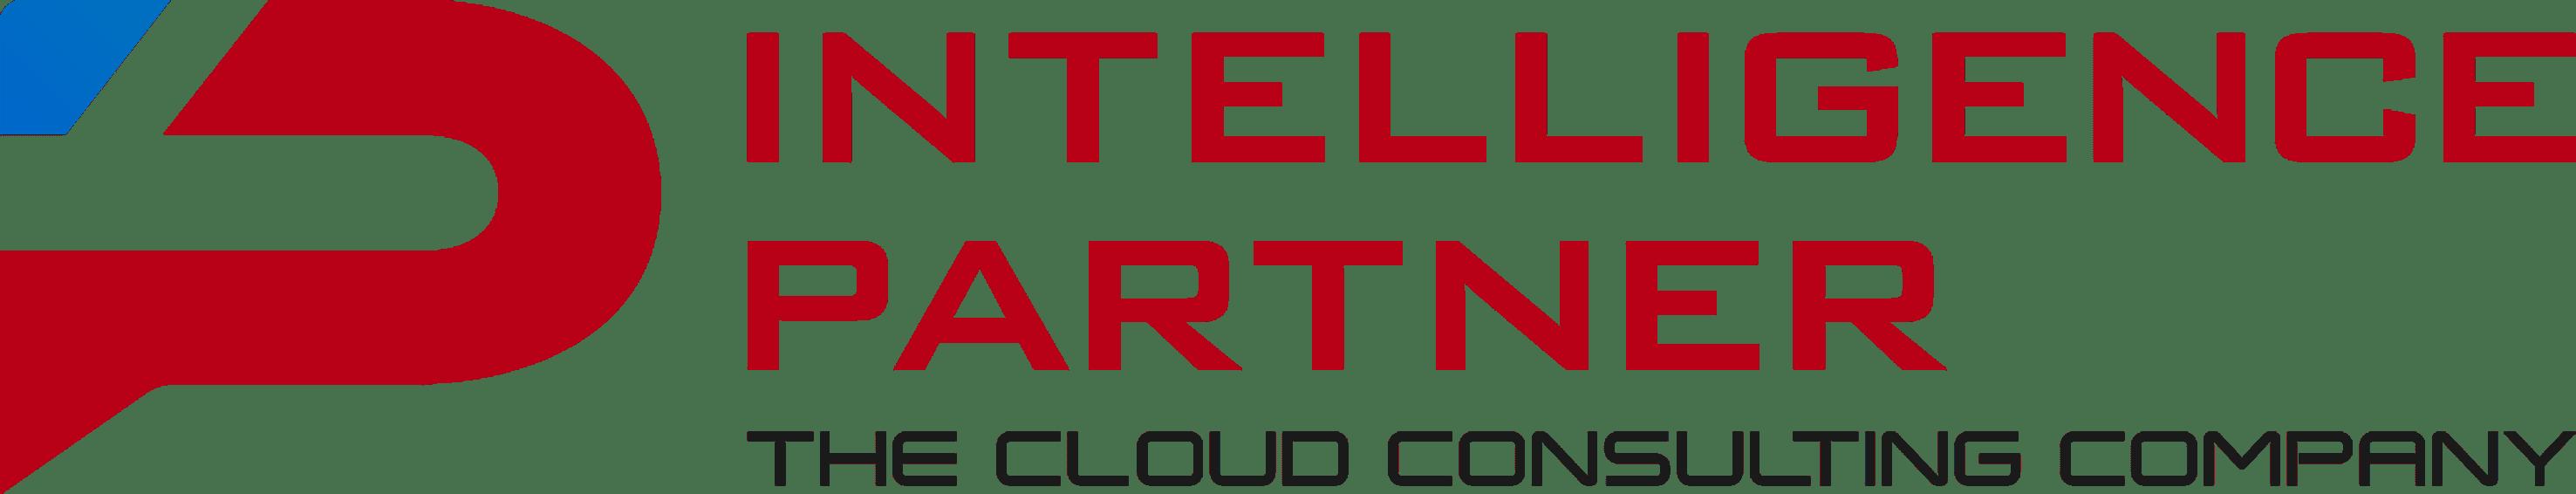 intelligence partner logo